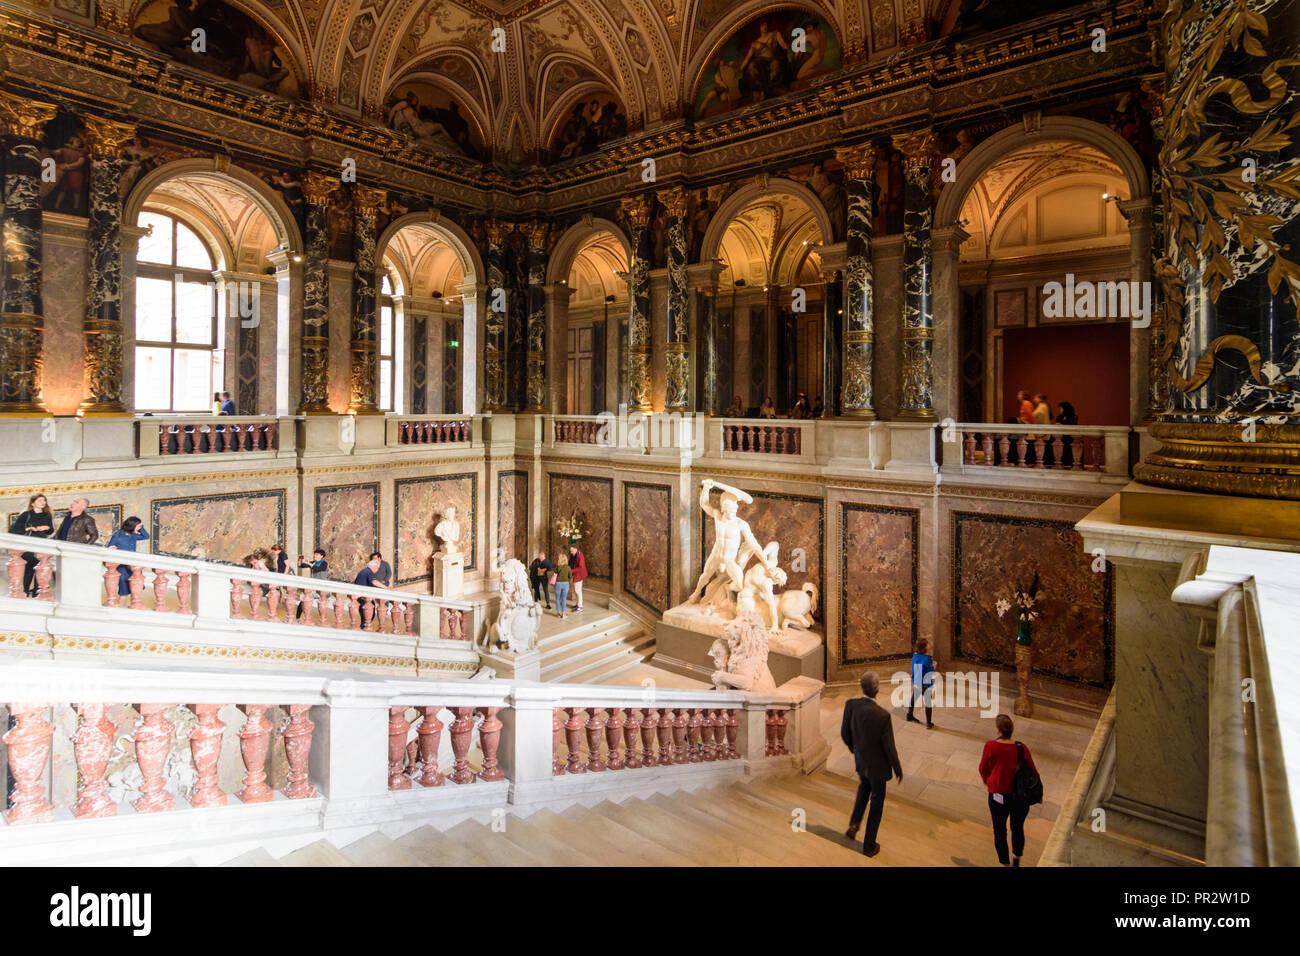 Wien, Vienna: Kunsthistorisches Museum (KHM, Museum of Art History, Museum of Fine Arts), main staircase, 01. Old Town, Wien, Austria Stock Photo